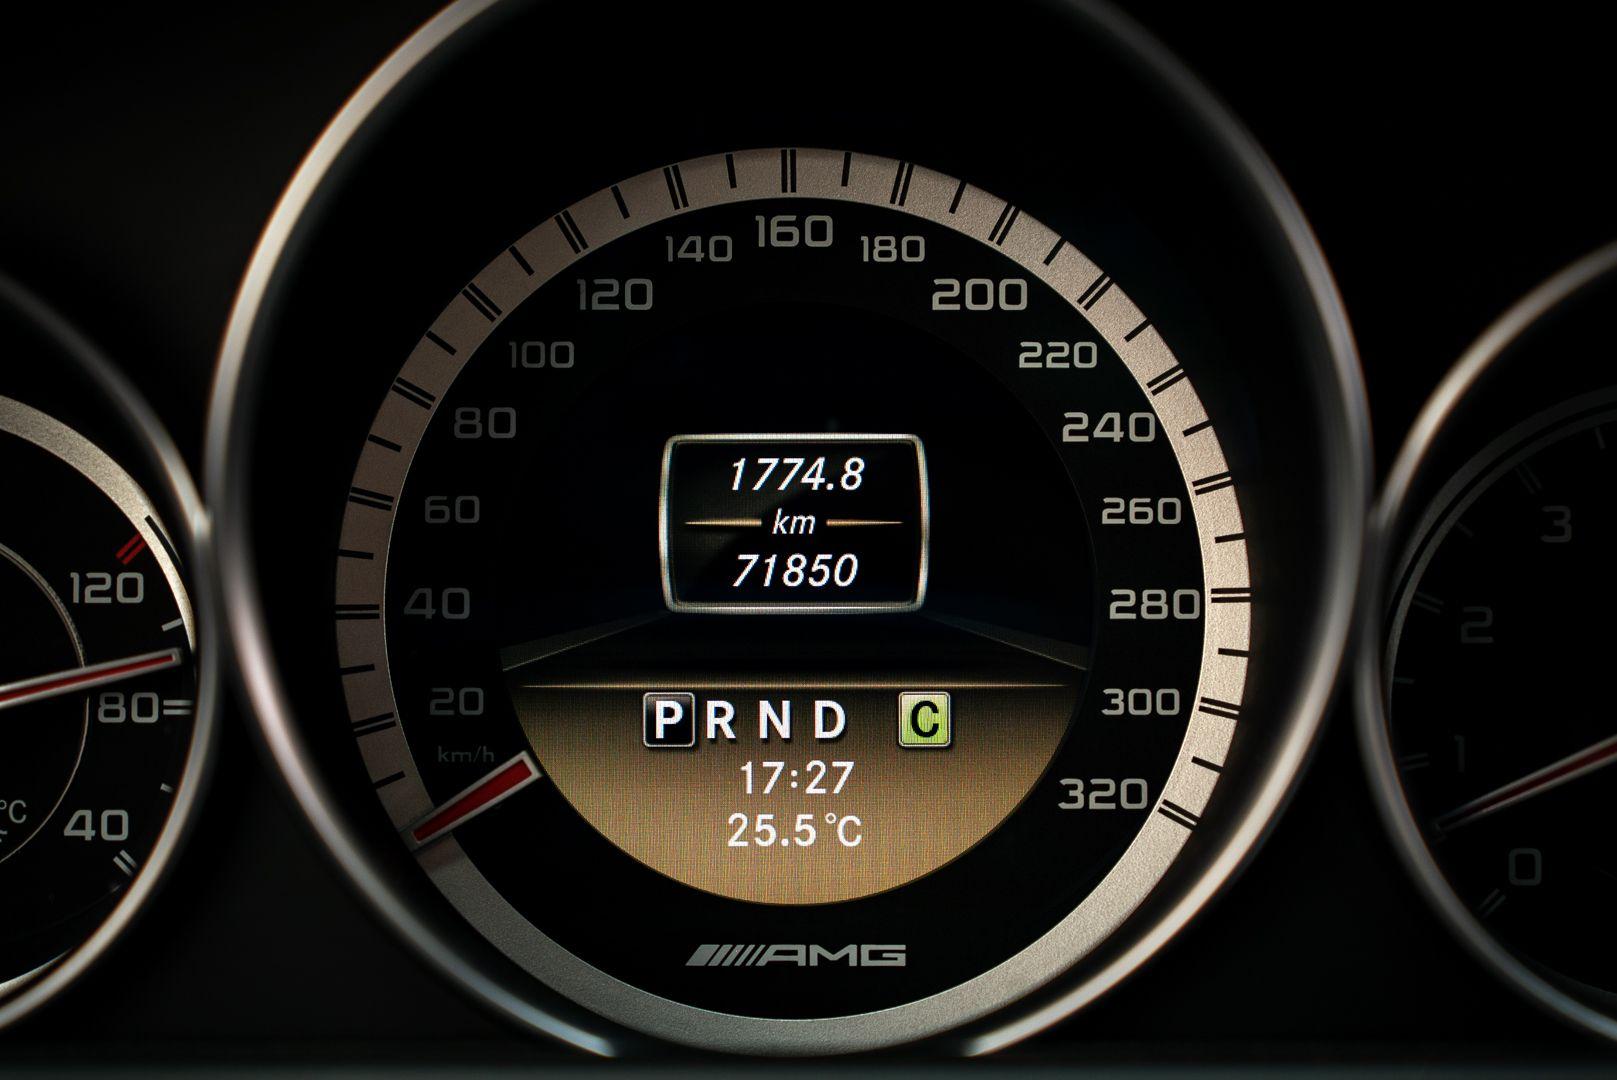 2012 Mercedes-Benz C63 AMG Black Series 71803